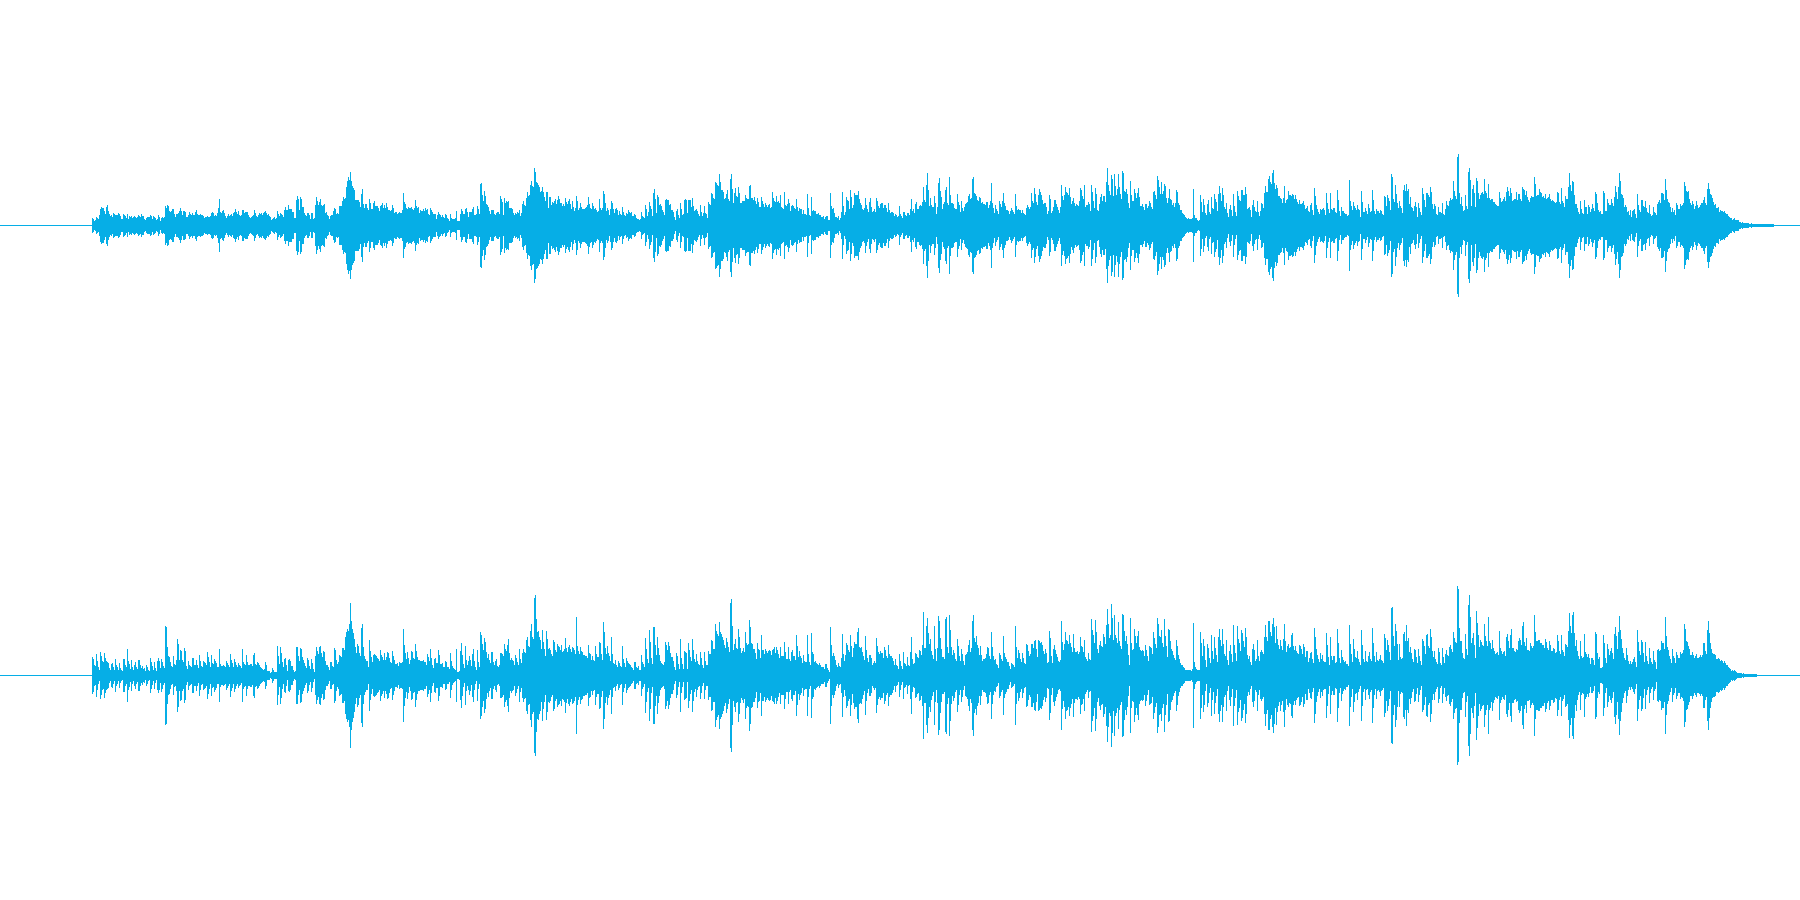 ma-ko song2の再生済みの波形